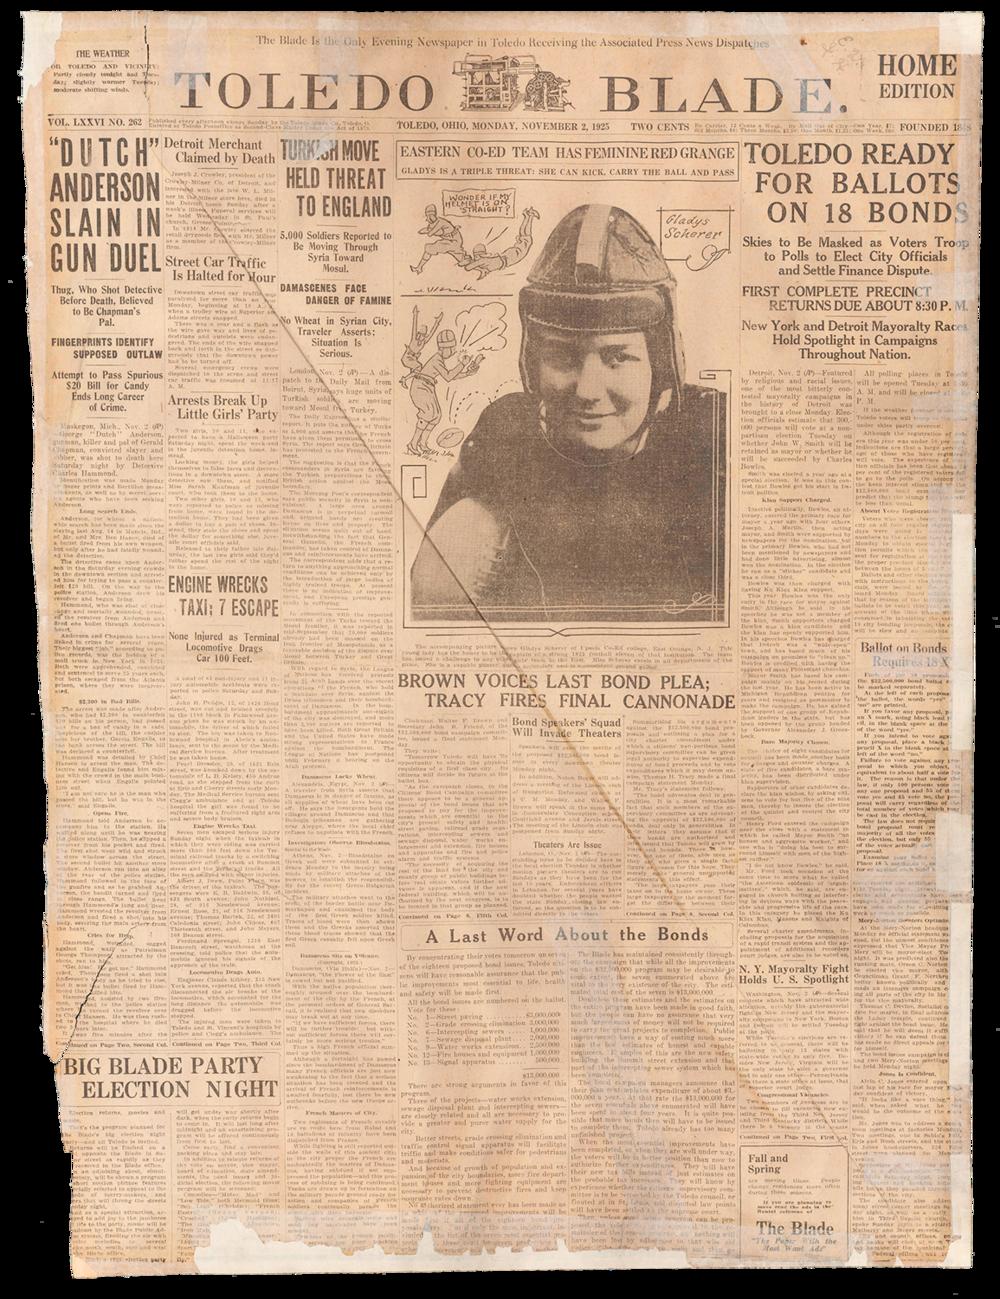 BVthumb-TB-1925-copy.png